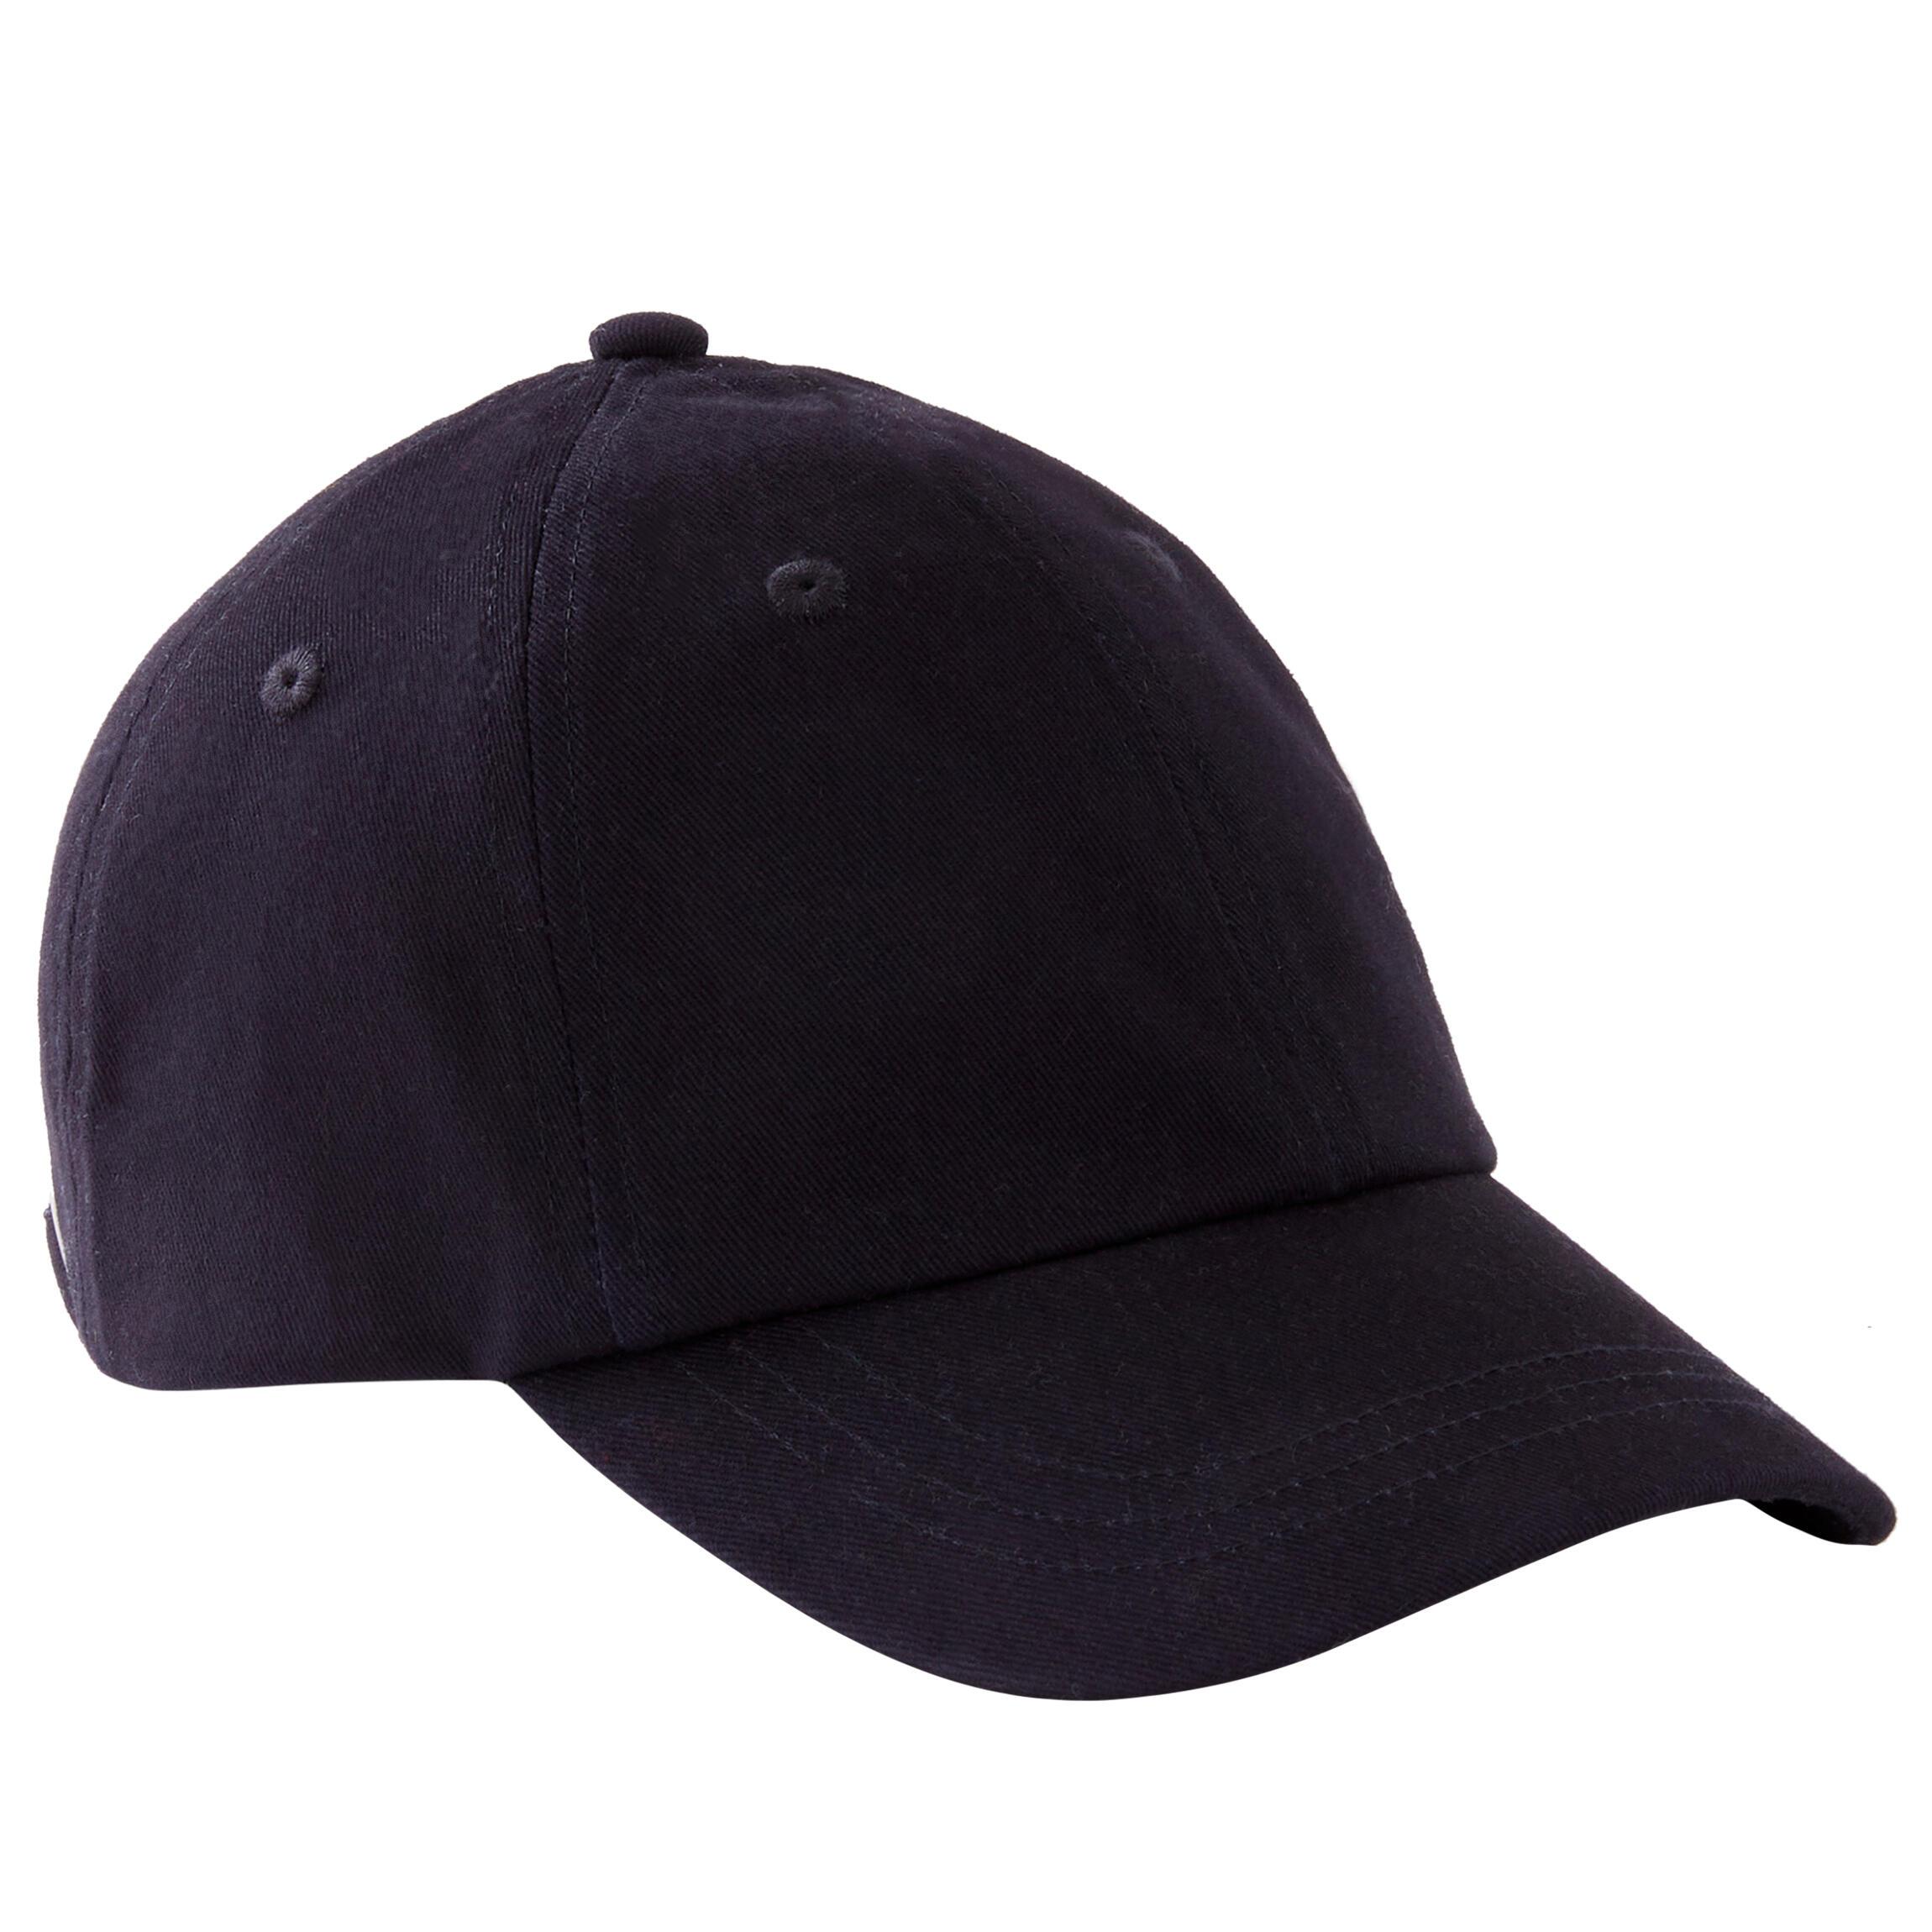 Șapcă W100 Fete la Reducere poza